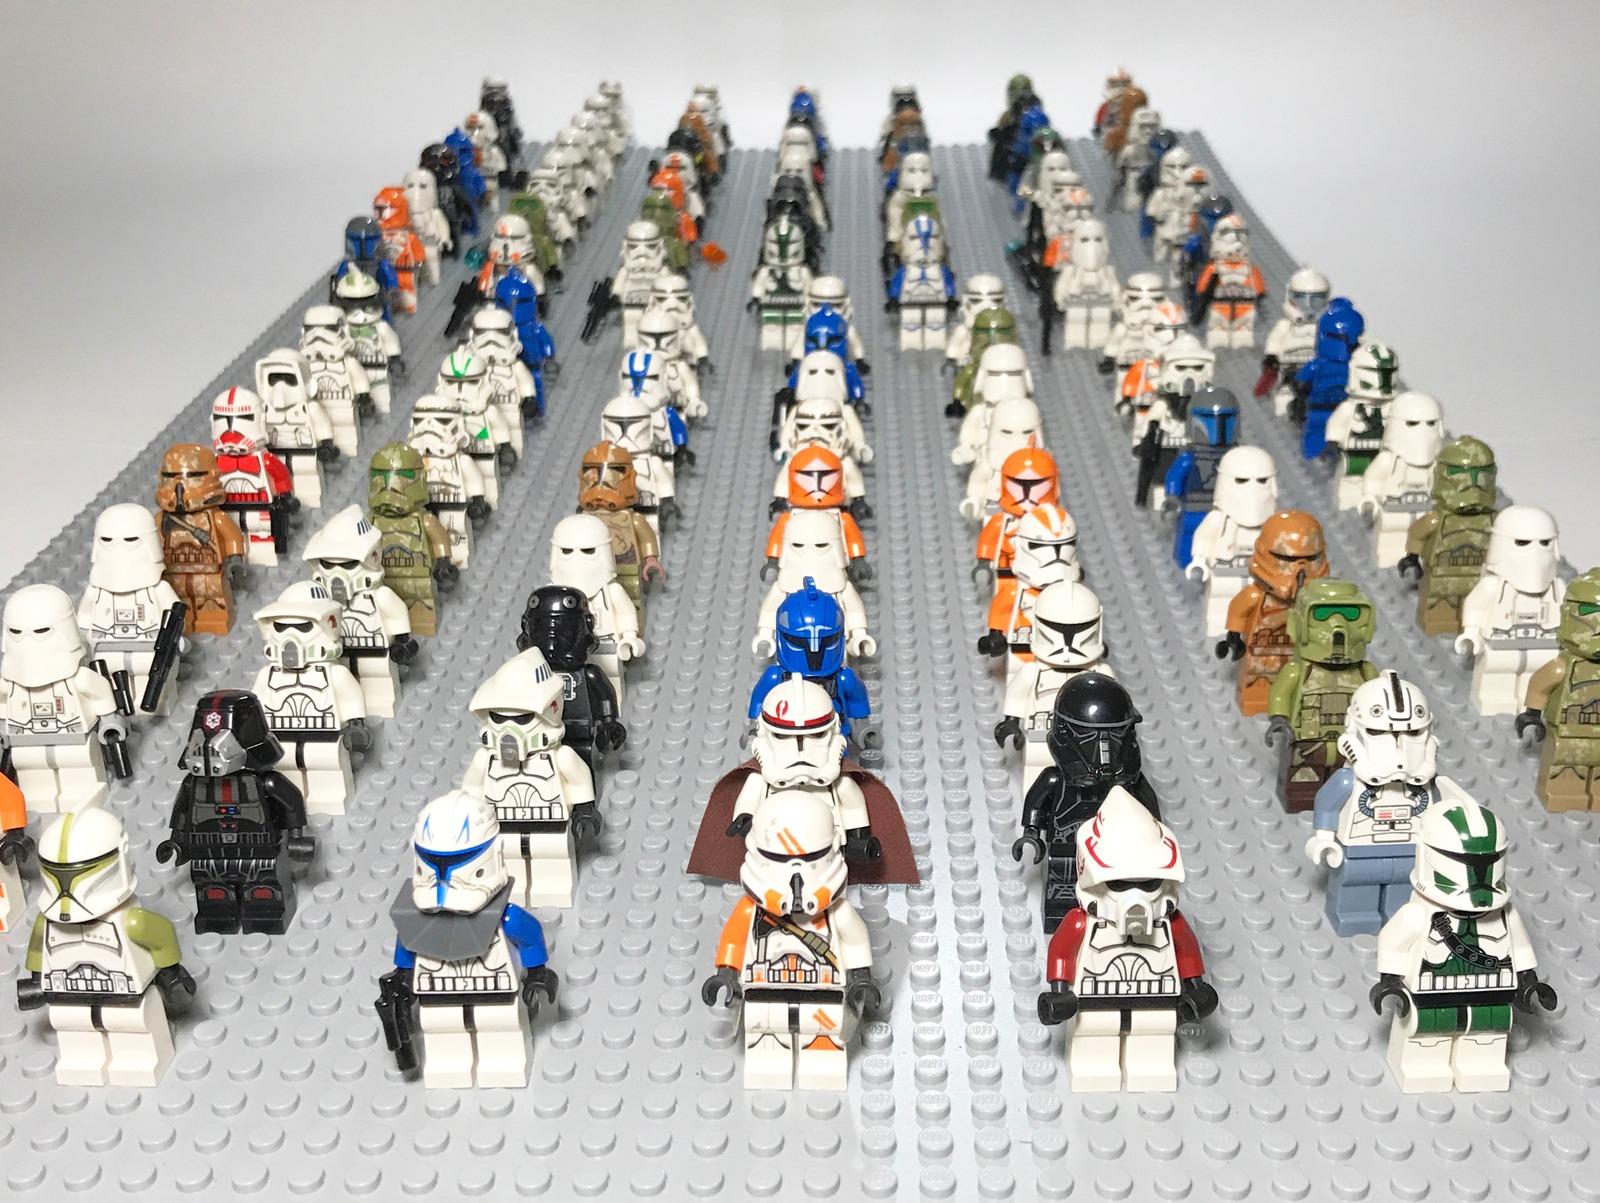 LEGO STAR WARS Minifigures 4 Figures ONLY PER LOT All Random READ DESCRIPTION